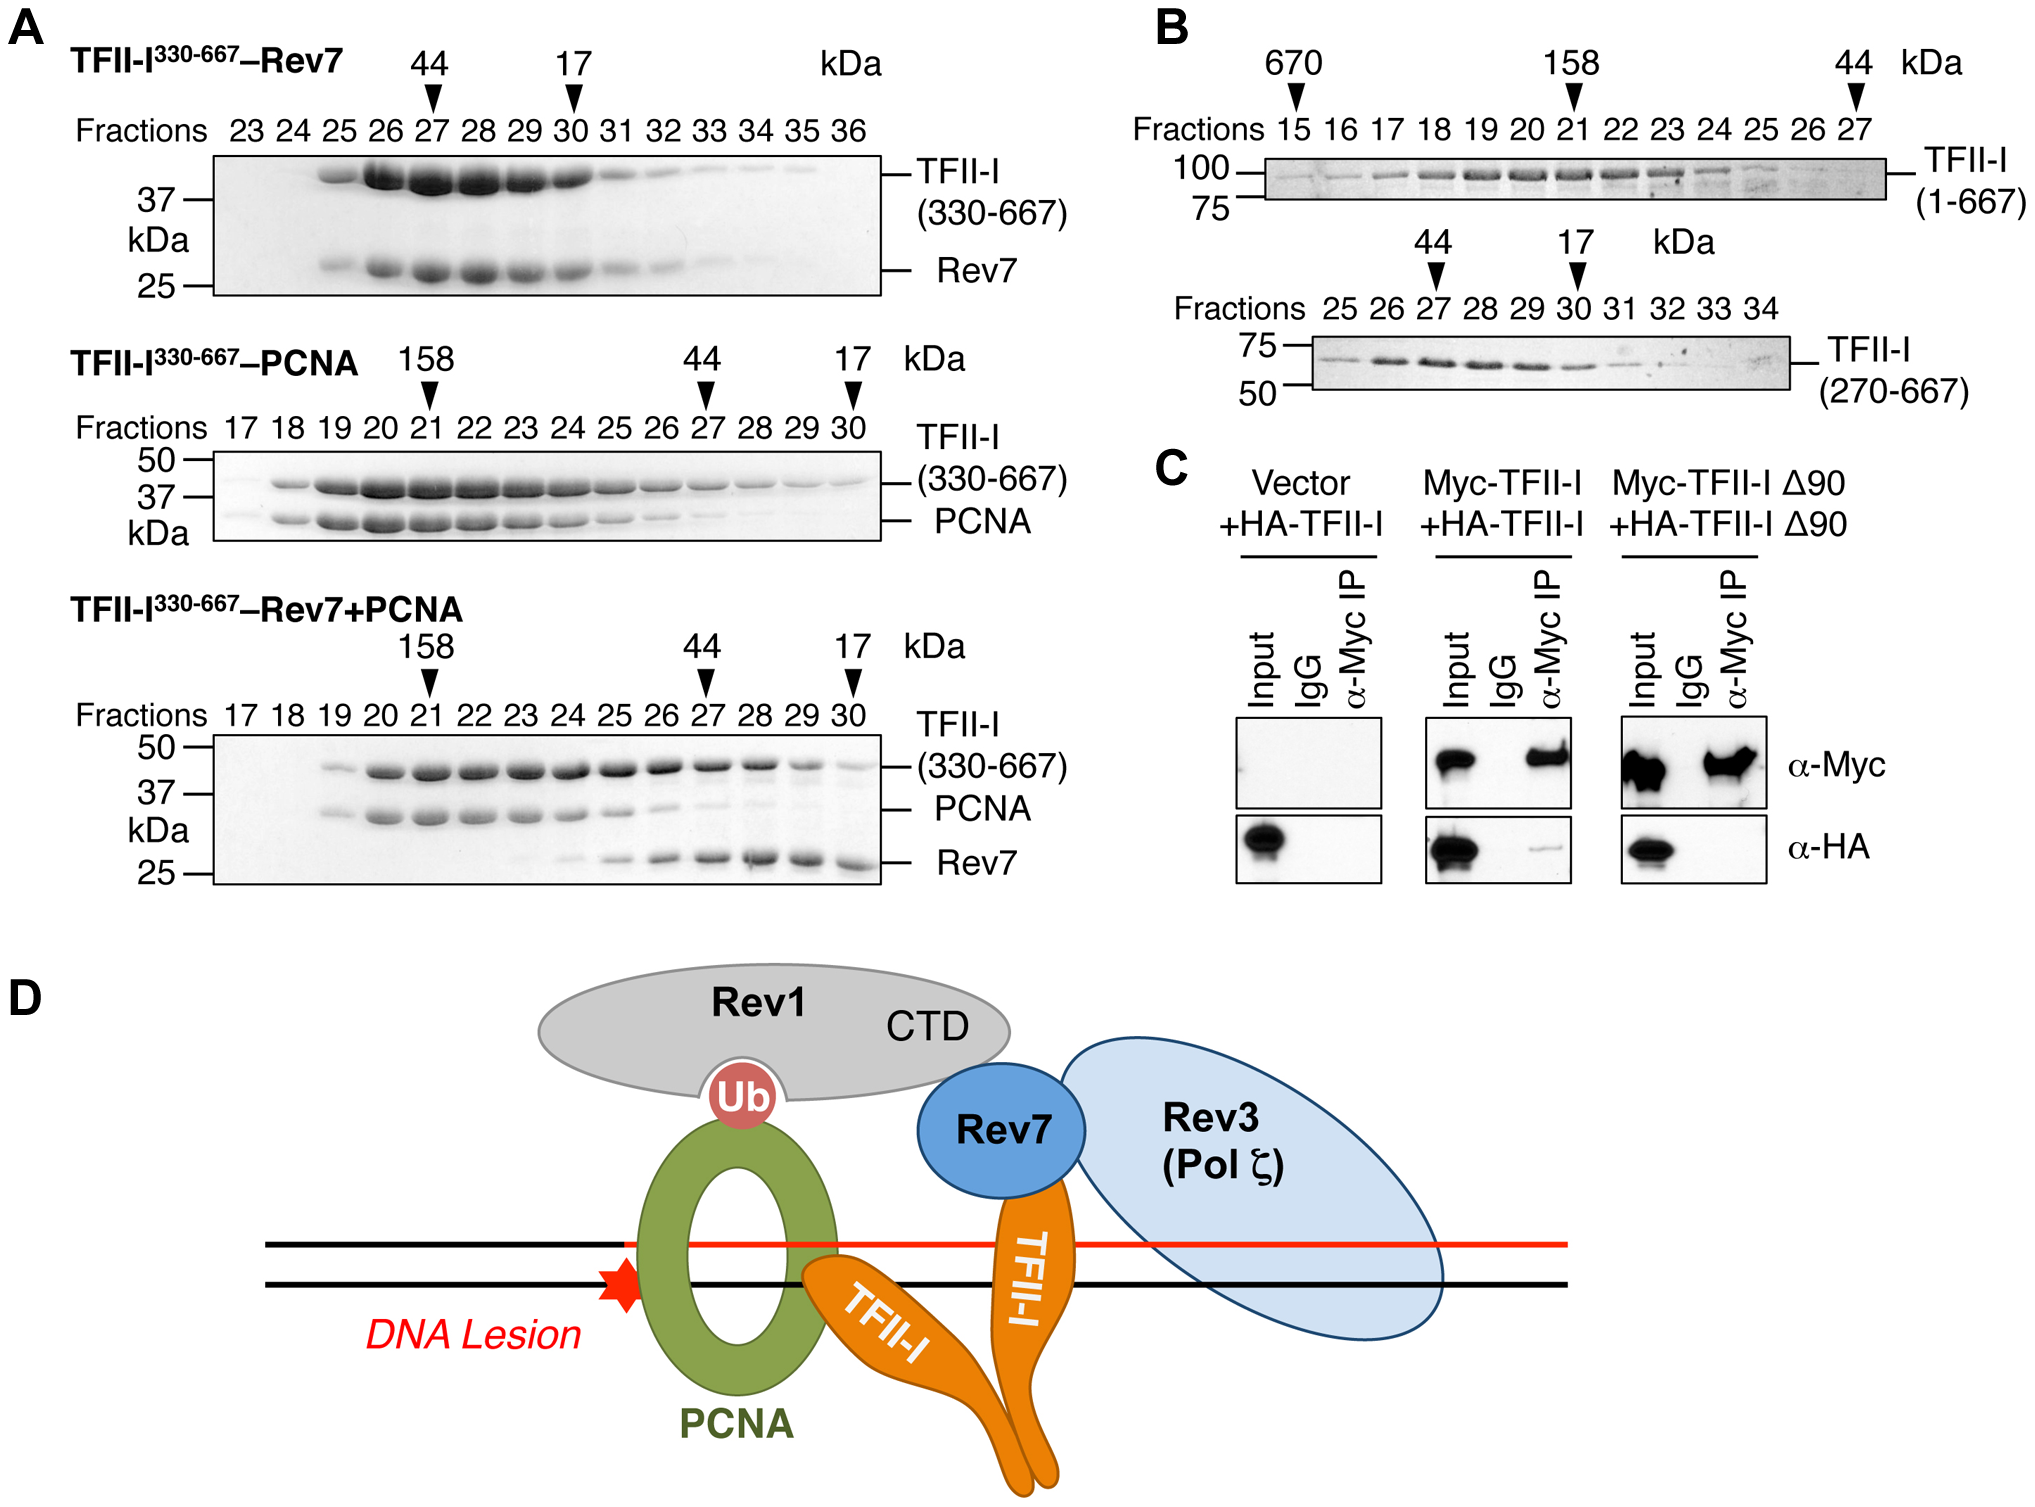 The TFII-I dimer bridges PCNA and Rev7.